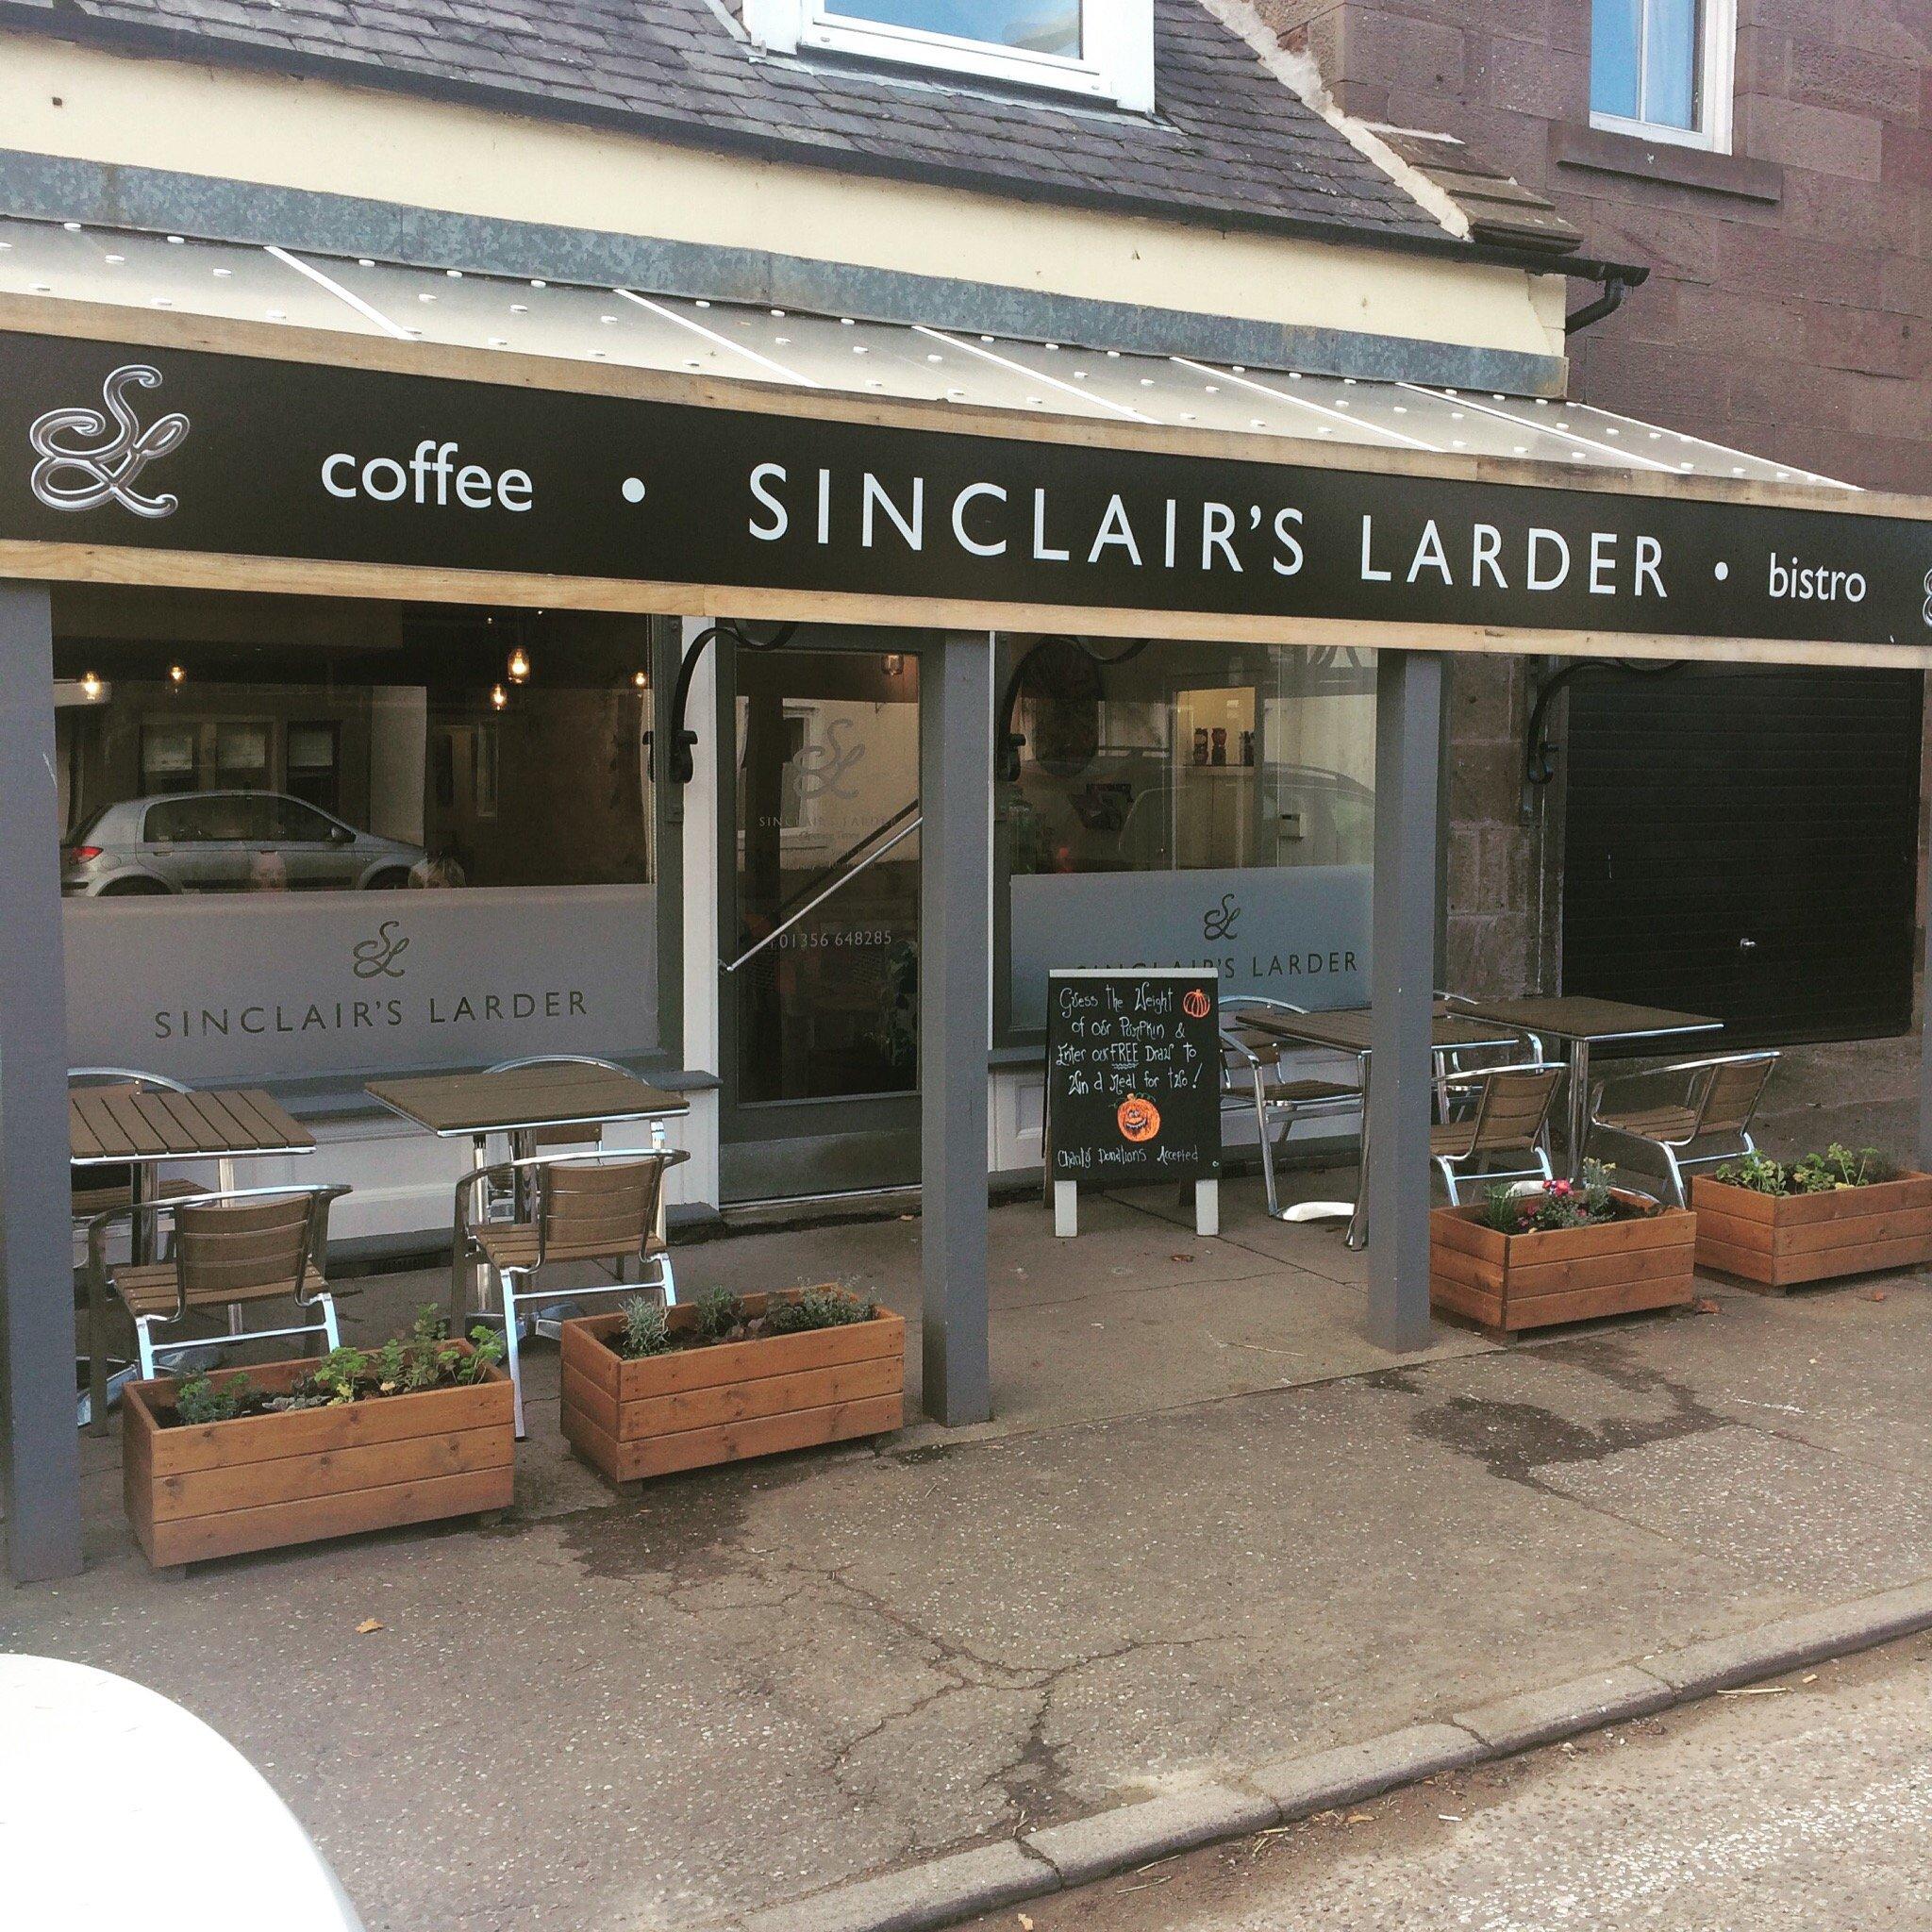 Sinclair's Larder